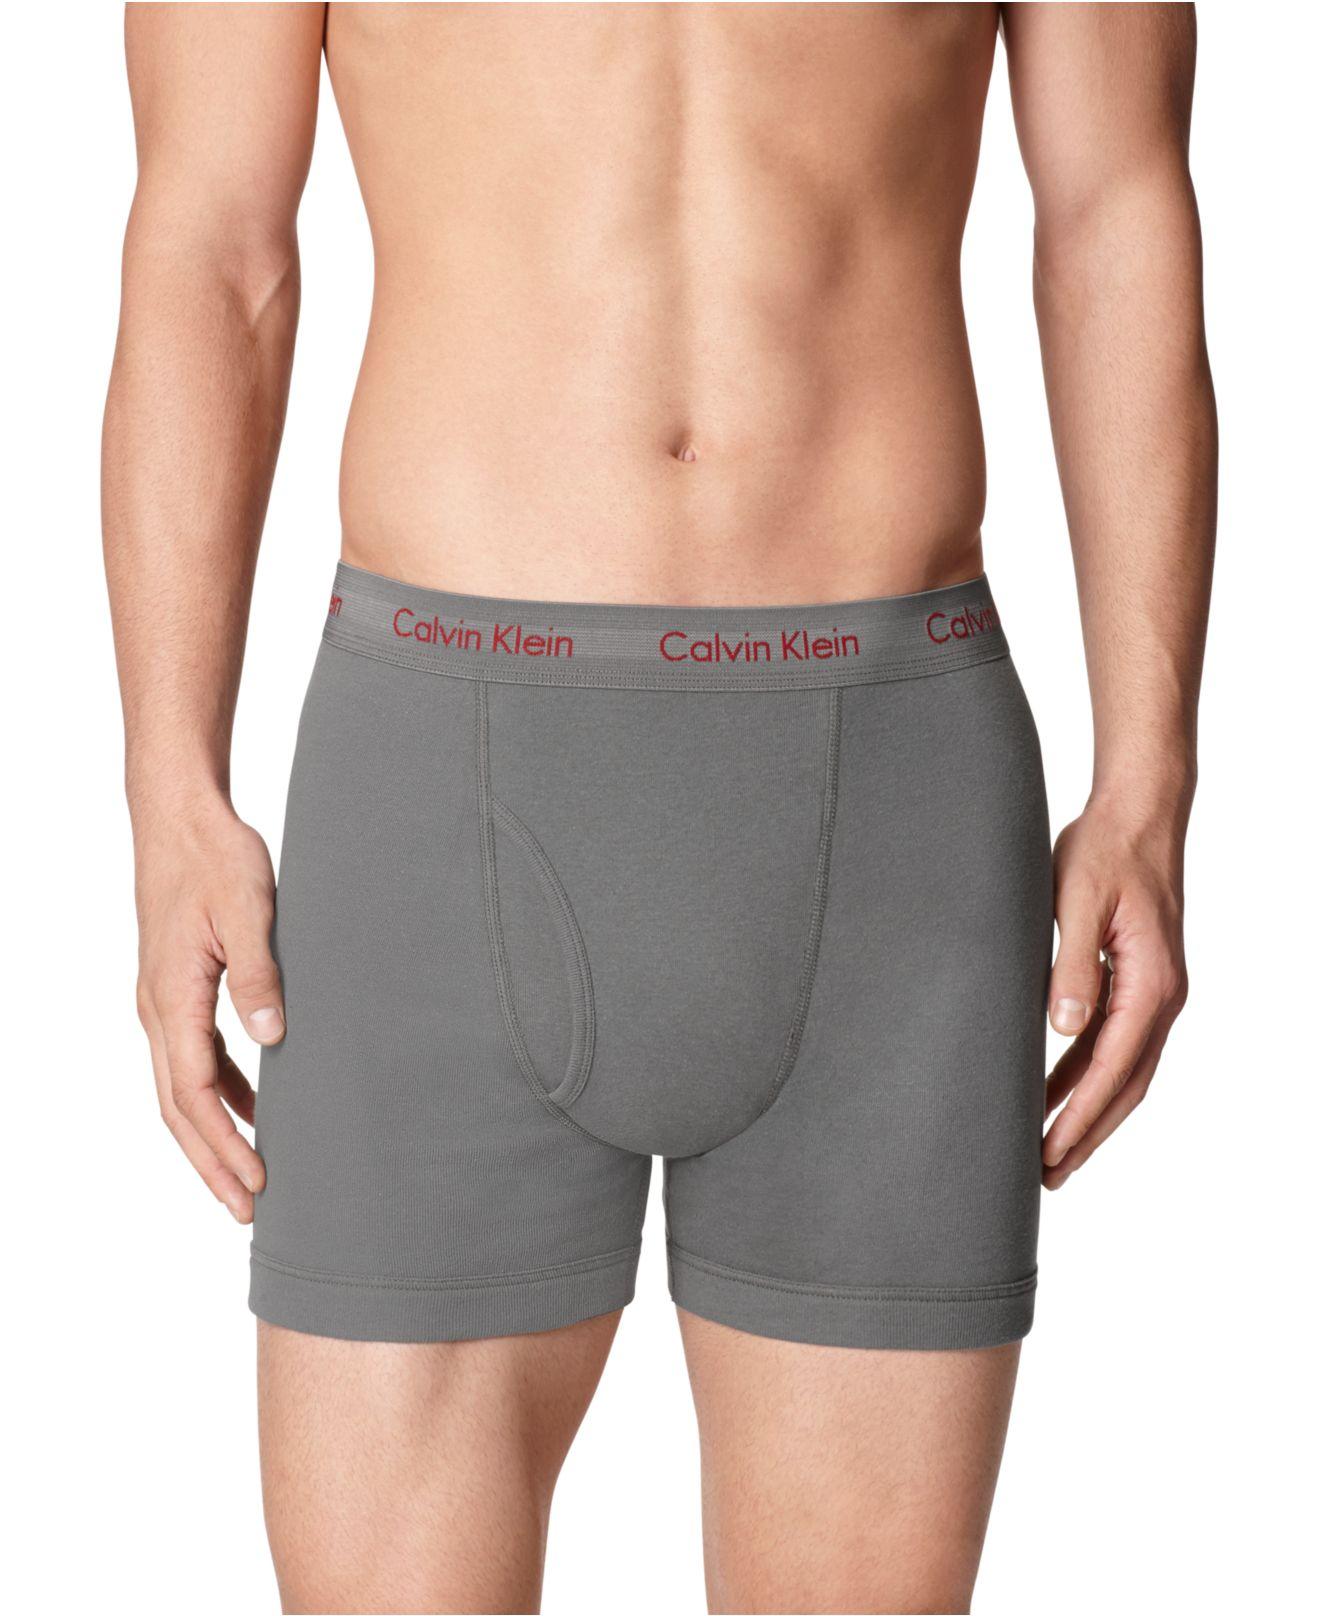 lyst calvin klein men 39 s boxer briefs 3 1 pack a macy 39 s exclusive for men. Black Bedroom Furniture Sets. Home Design Ideas